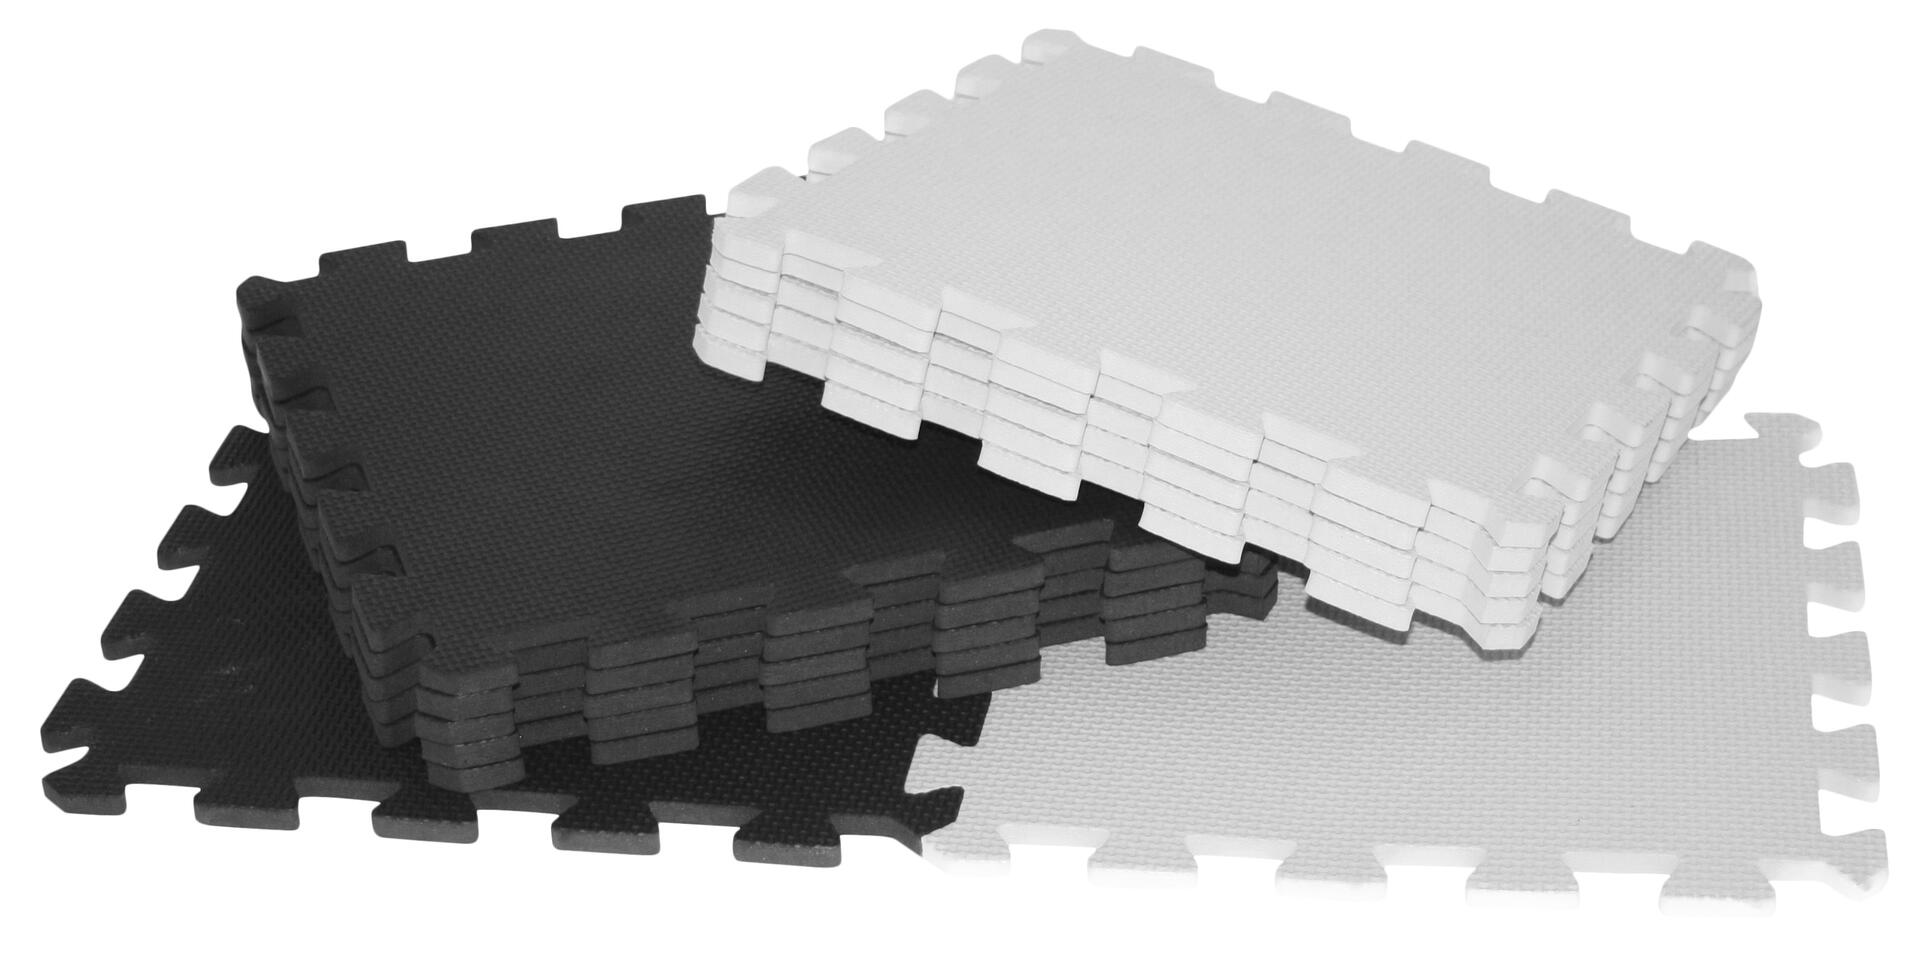 Pusselmatta svart vit - Lekolar Sverige c609602edbc85